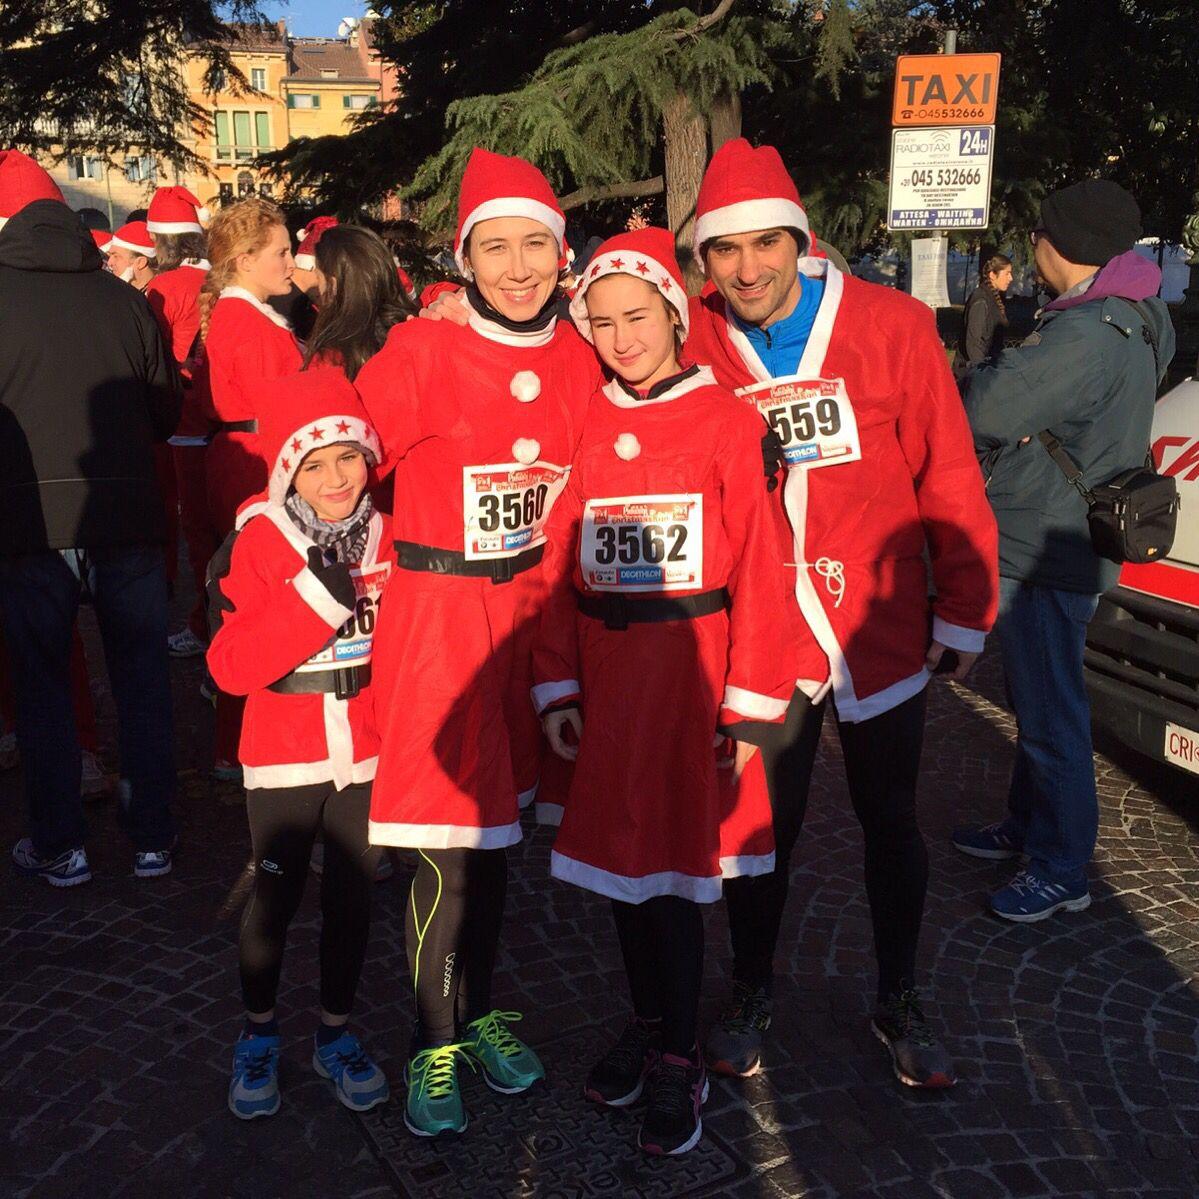 Christmas run #running #funny #family #christmas #photooftheday #verona